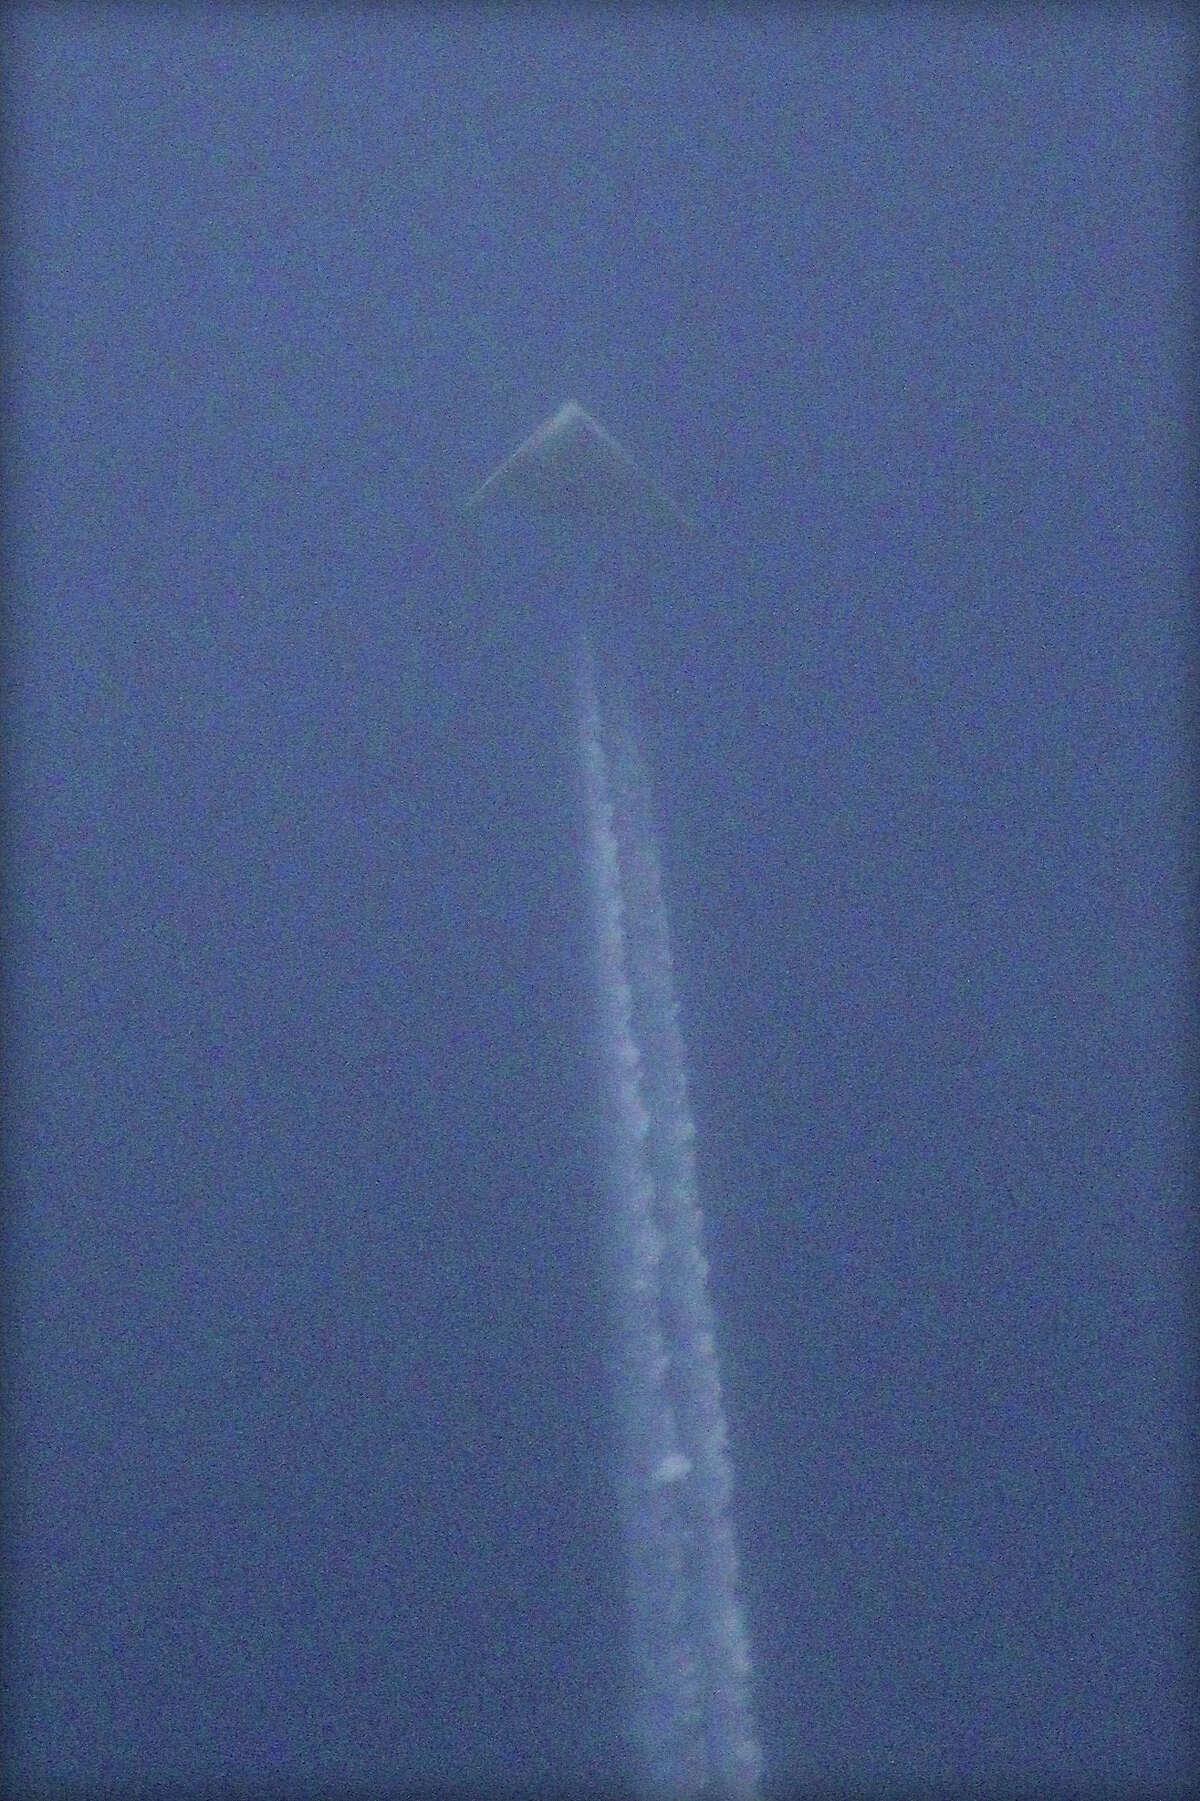 Mystery aircraft spotted over Kansas. (Jeff Templin photo)